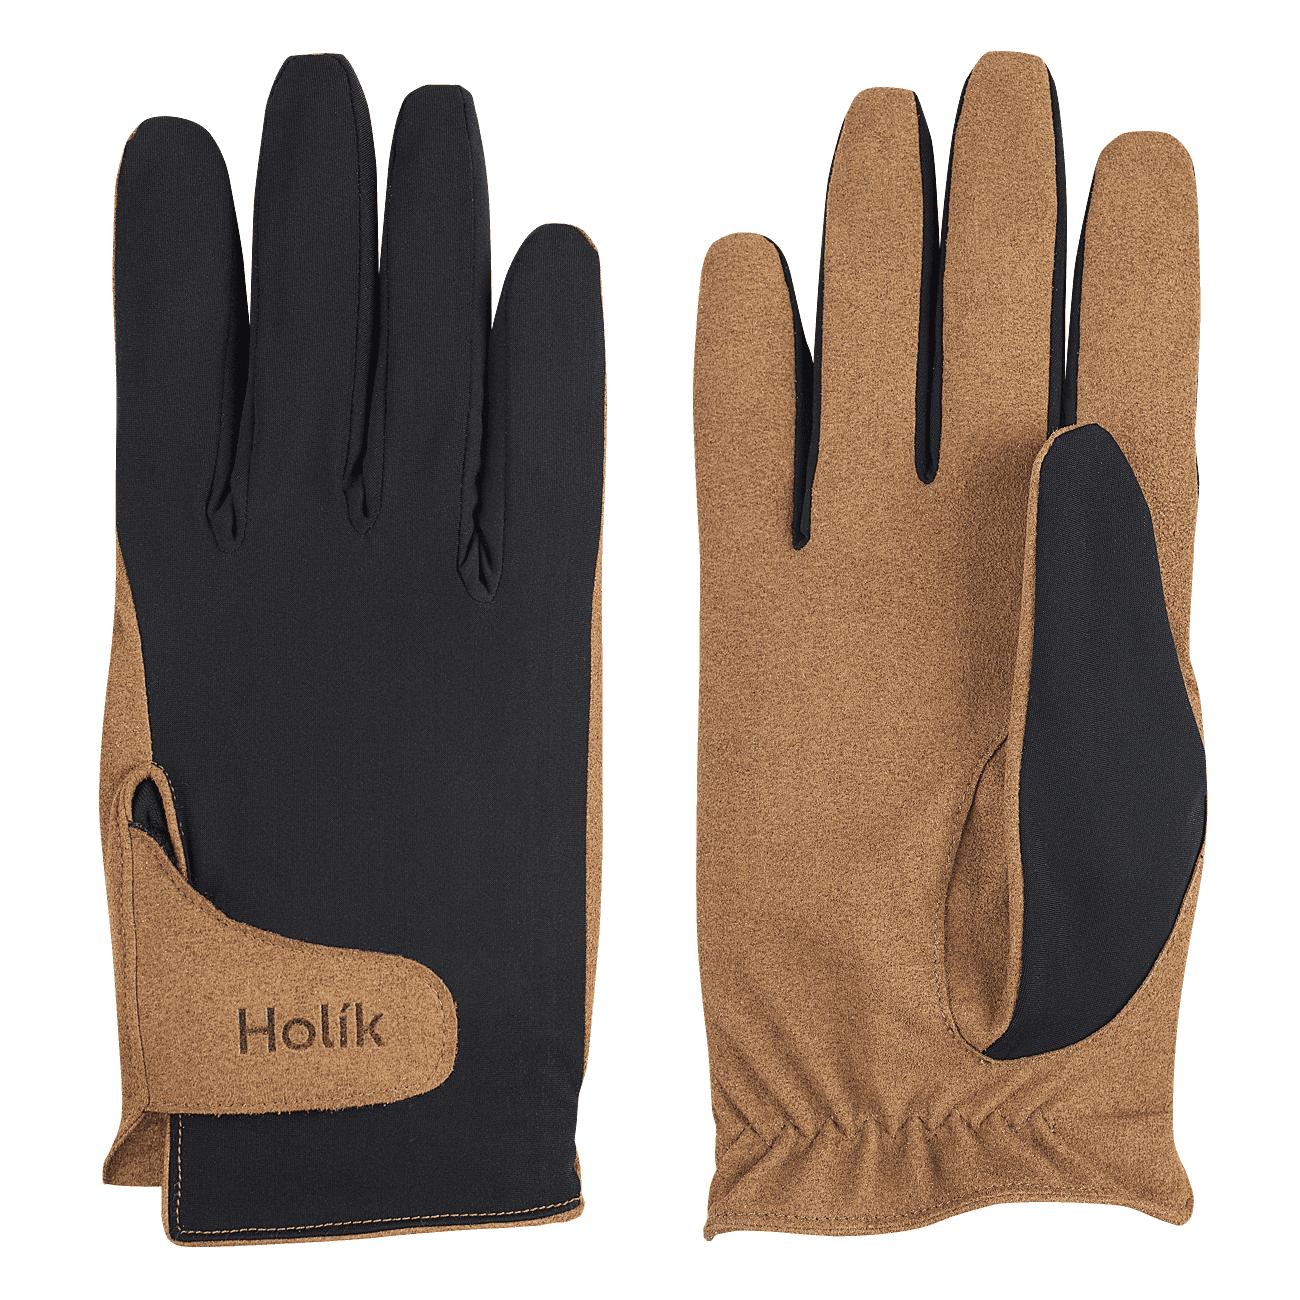 Holik Gloves Jessica Fingers 8385